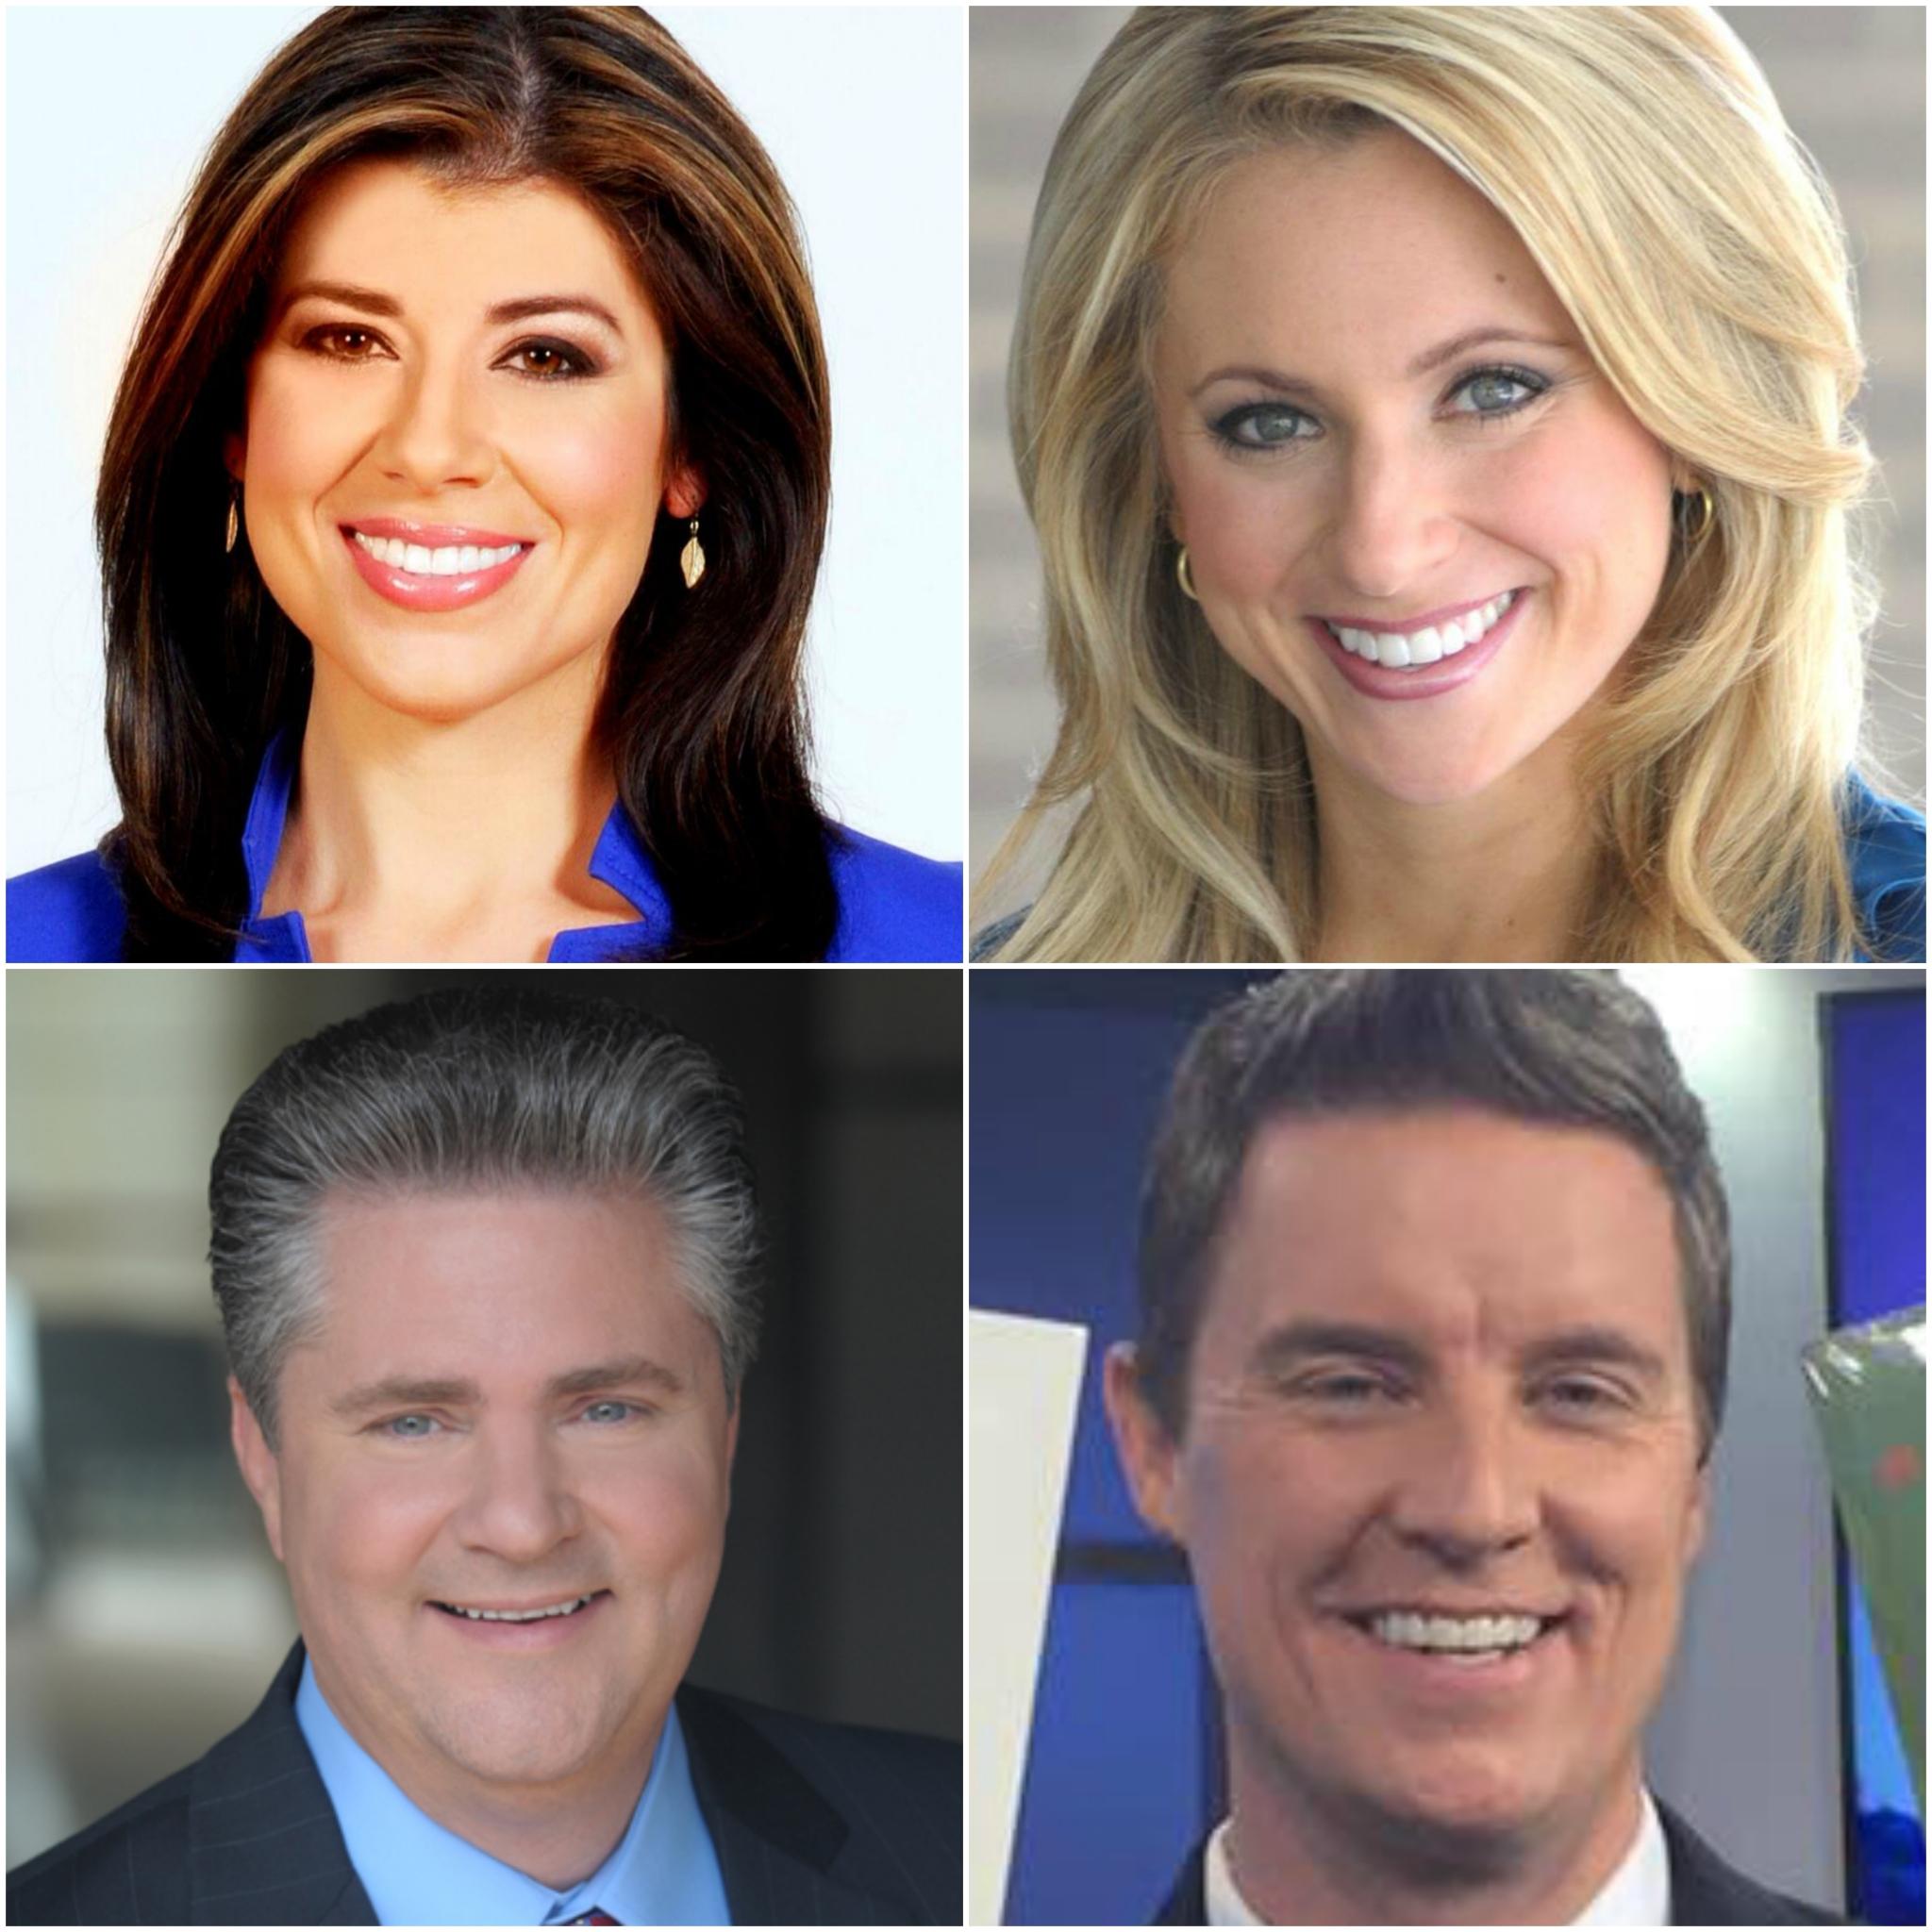 KHOU-TV announces major shakeup involving on-air personalities